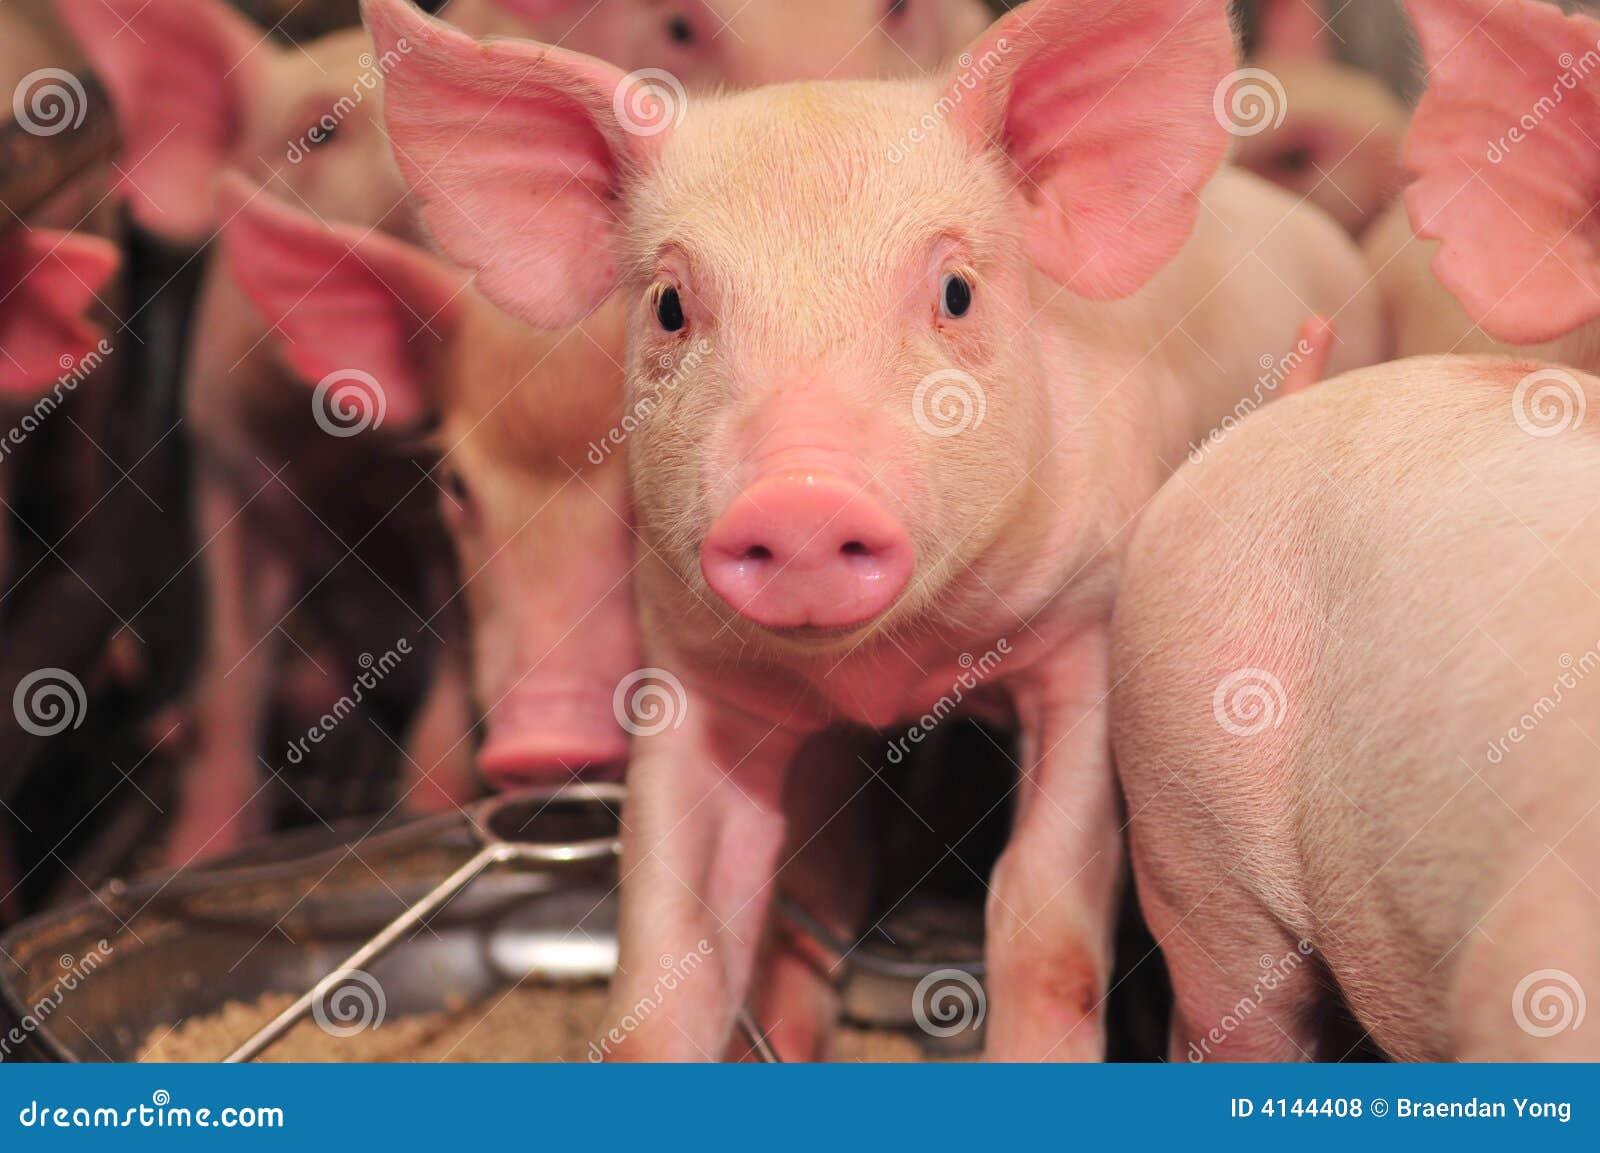 Pig Farm Royalty Free Stock Photos - Image: 4144408